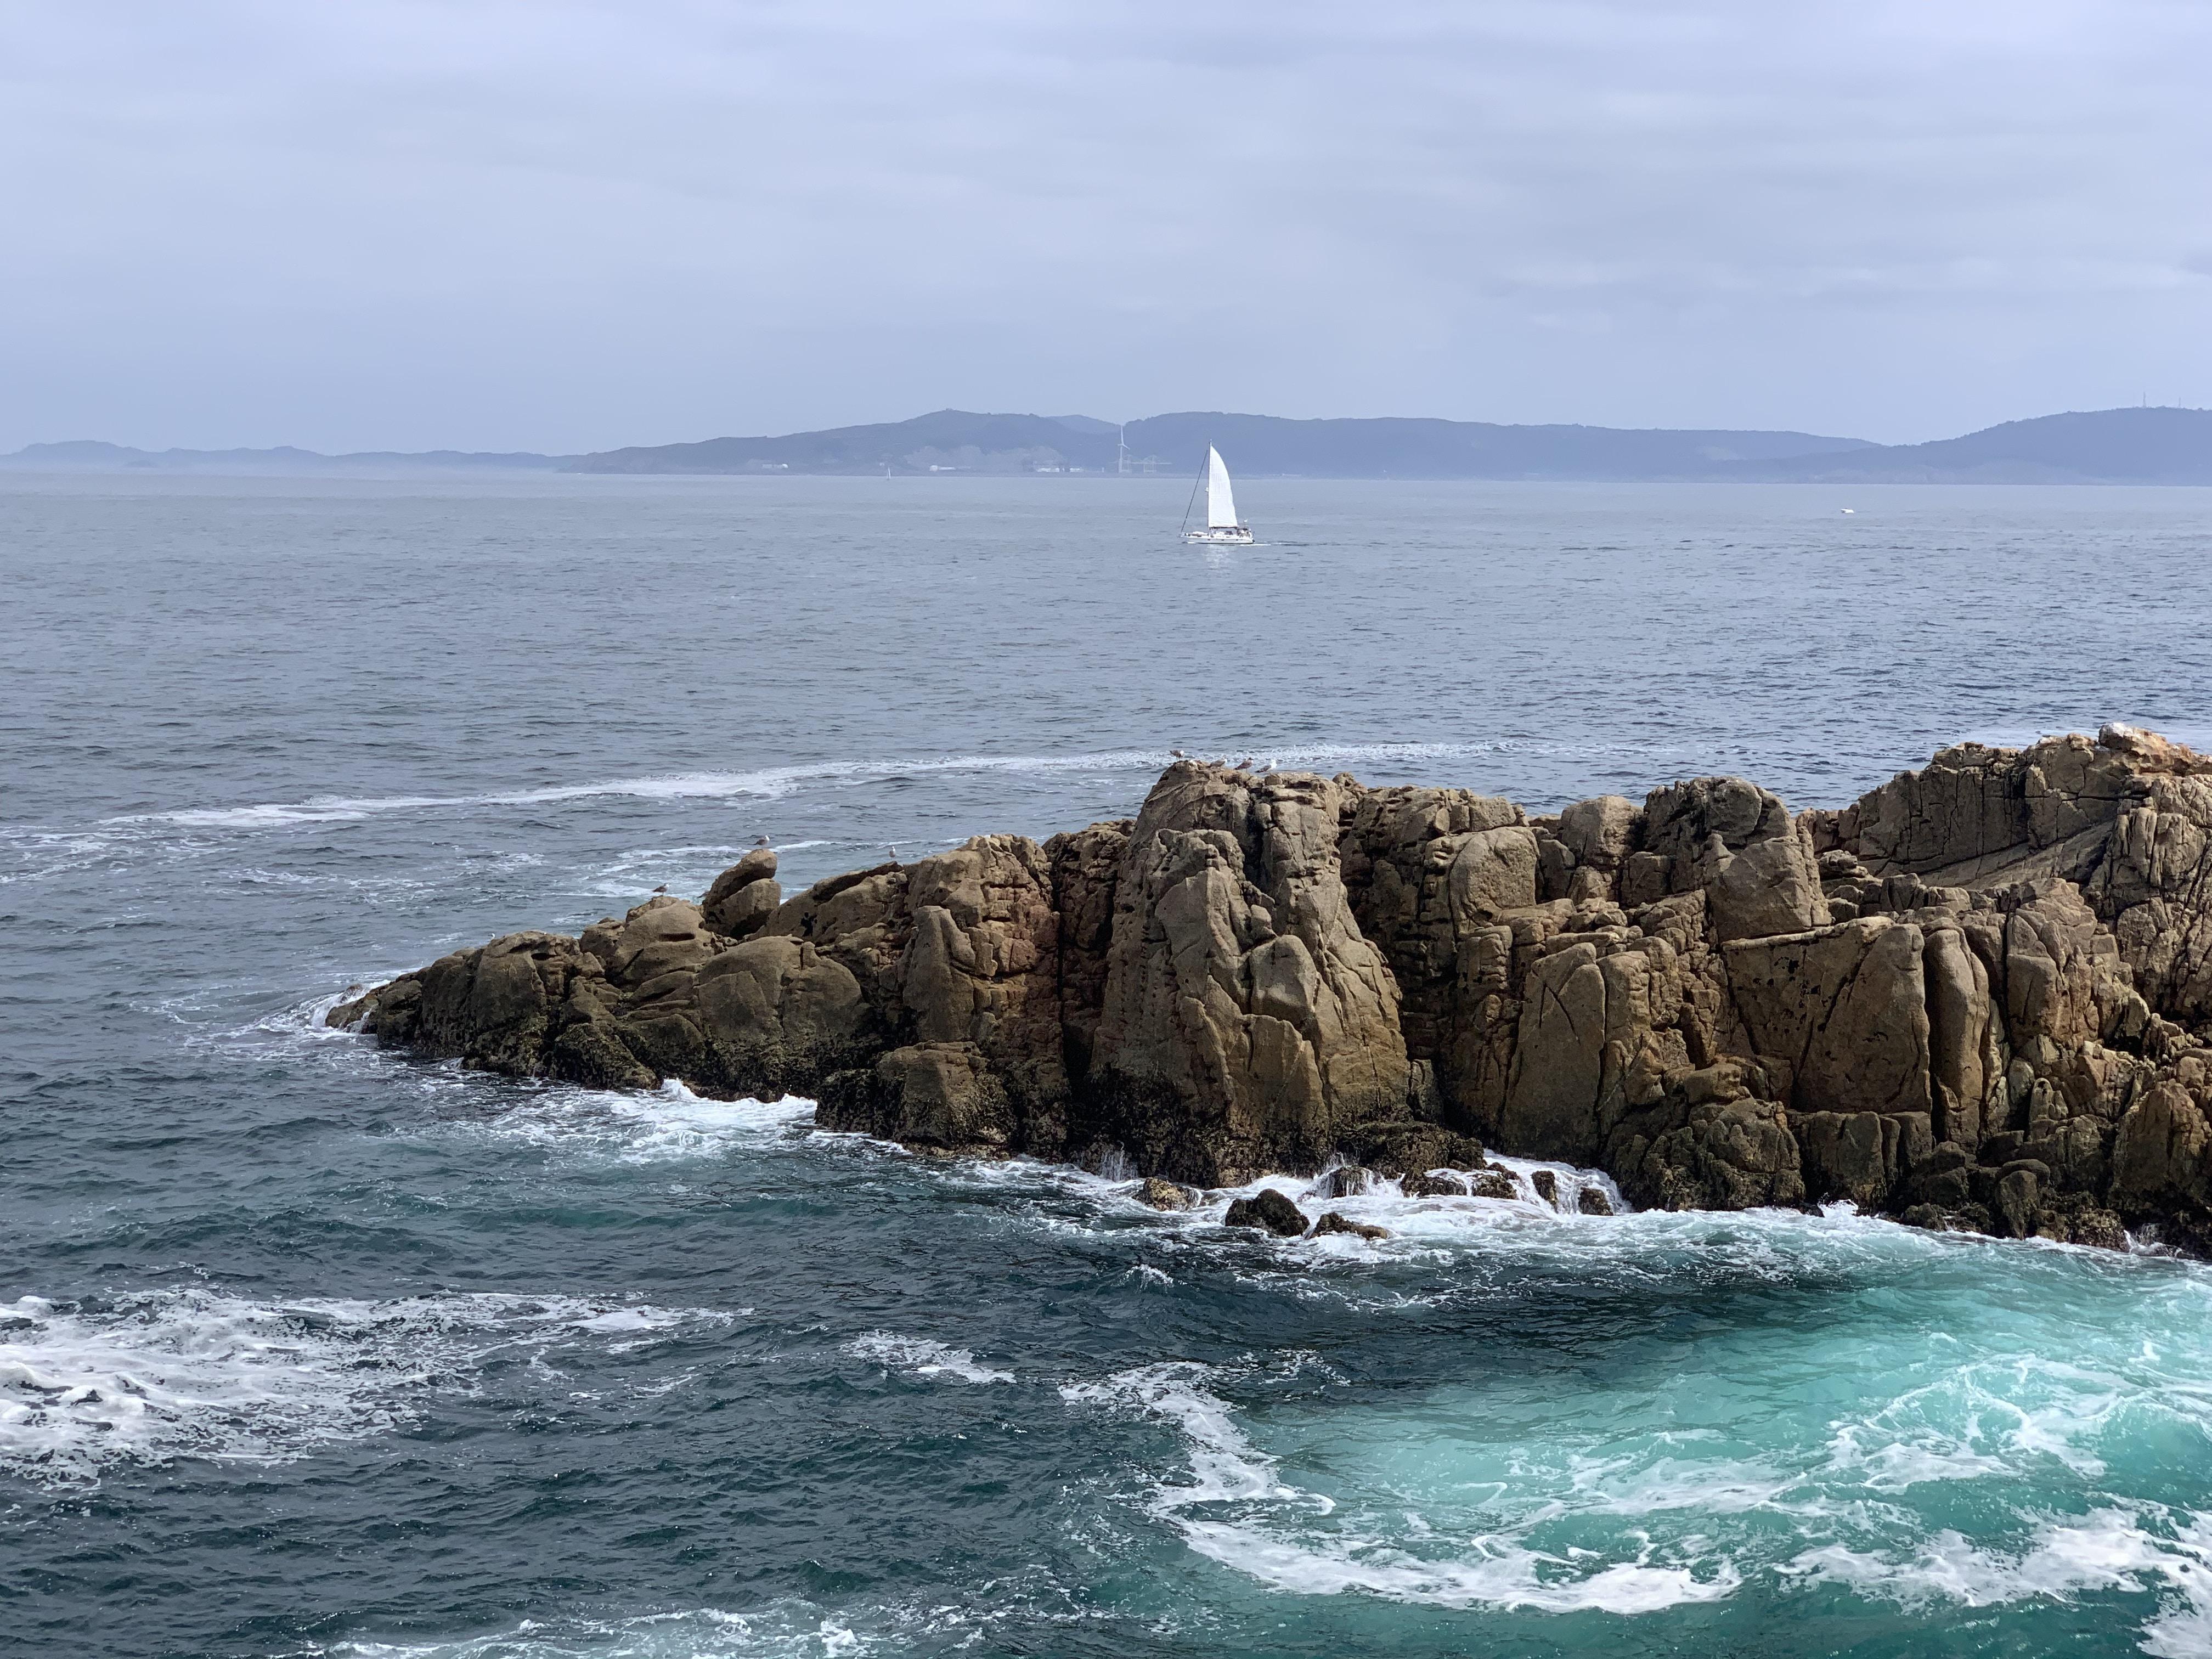 Coast of A Coruña. North of Spain. View of a sailing boat